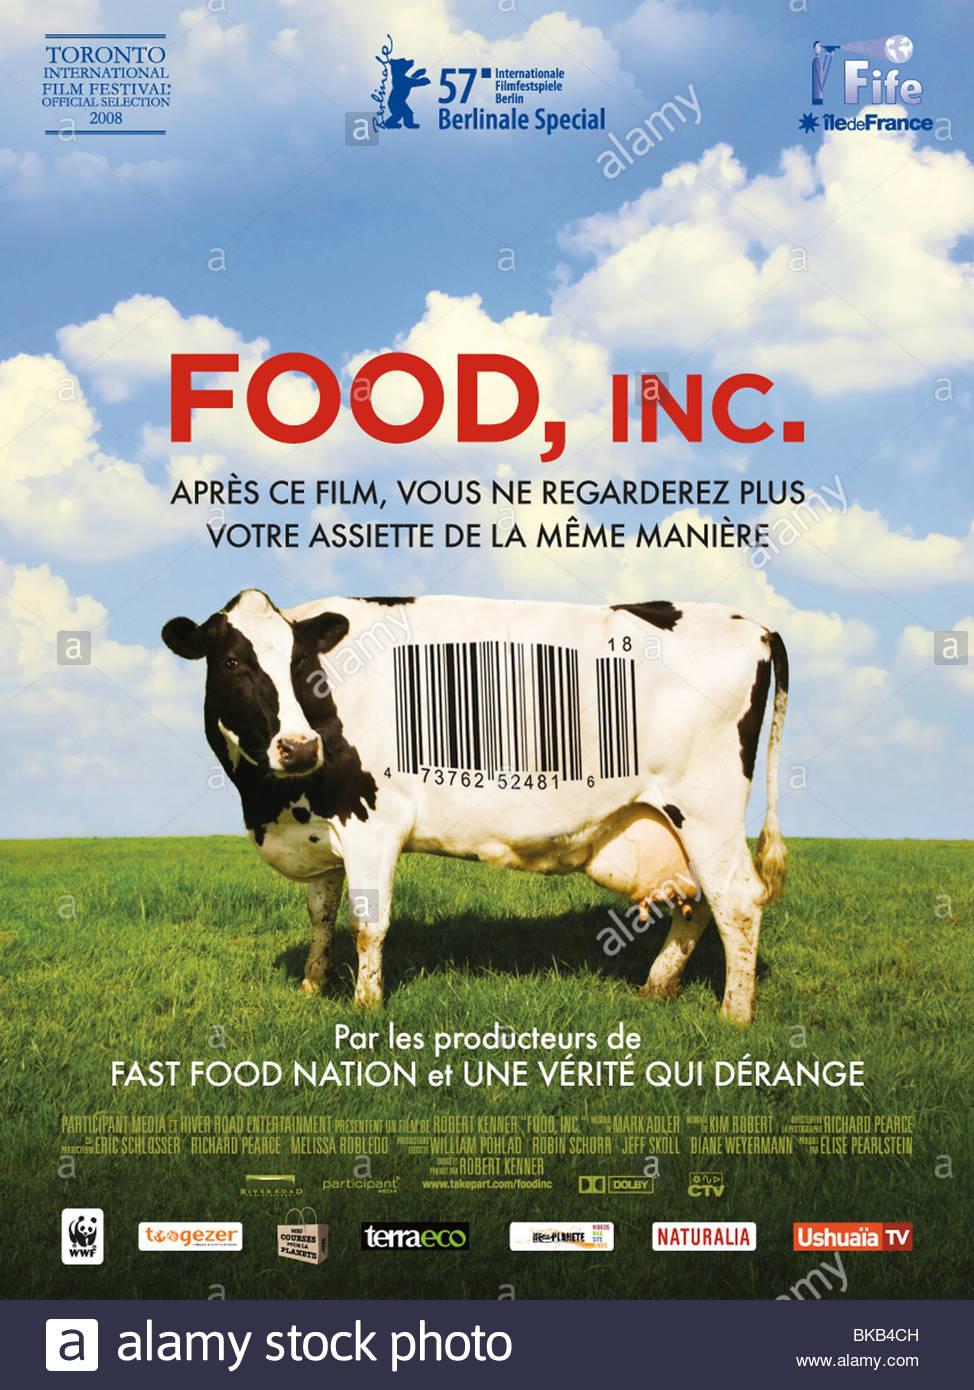 Food Inc Year 2008 Director Robert Kenner Documentary Movie Poster Fr